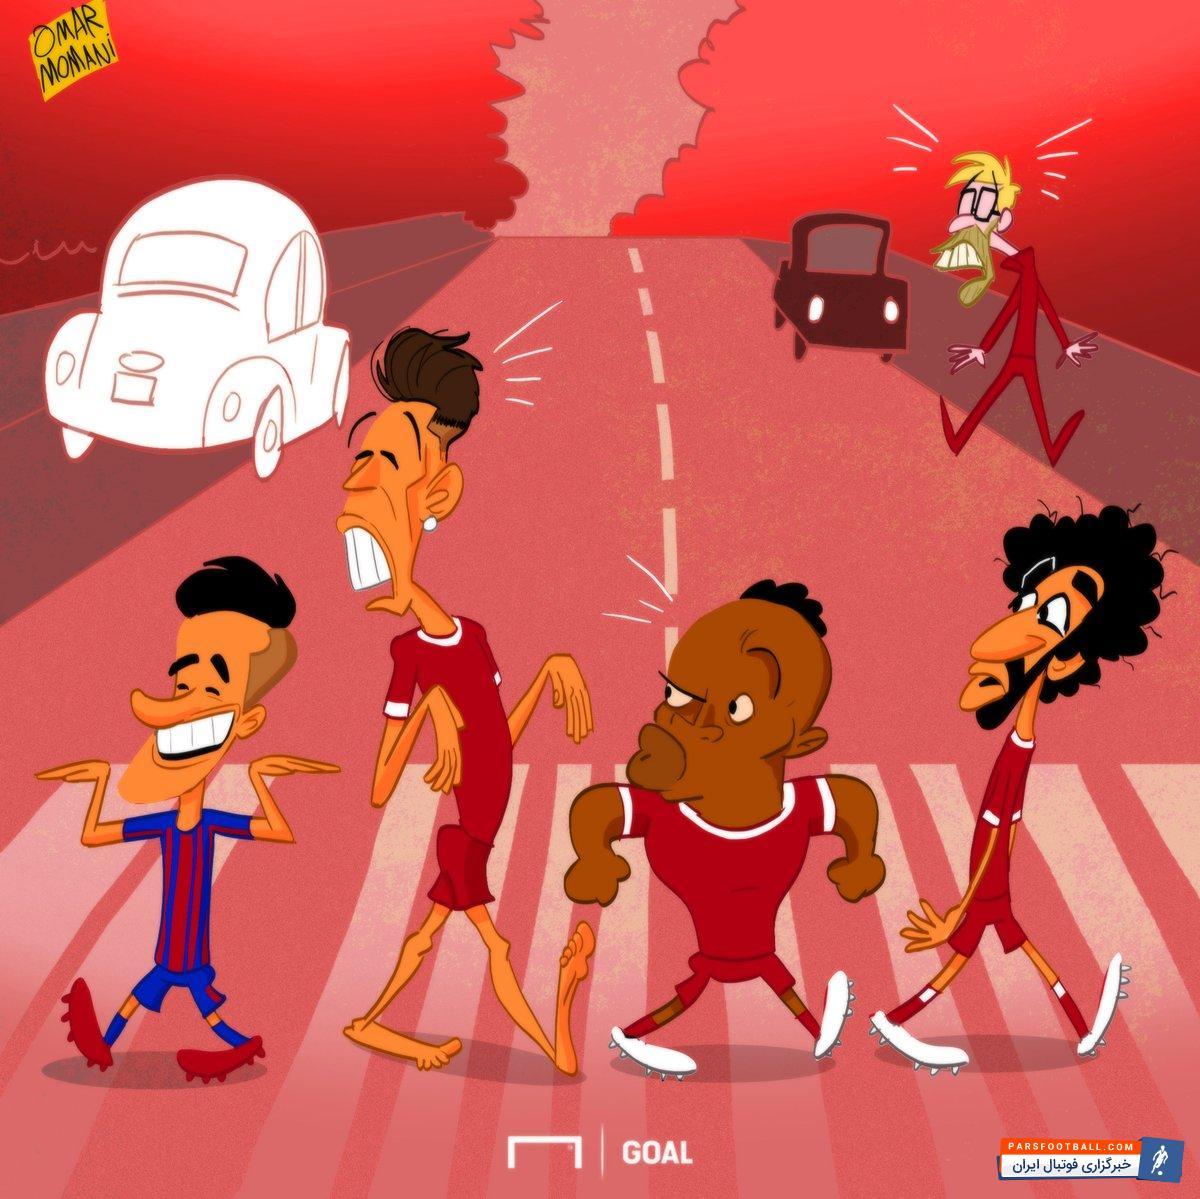 عکس ؛ کاریکاتور ؛ ستاره لیورپول سرانجام به بارسلونا پیوست !